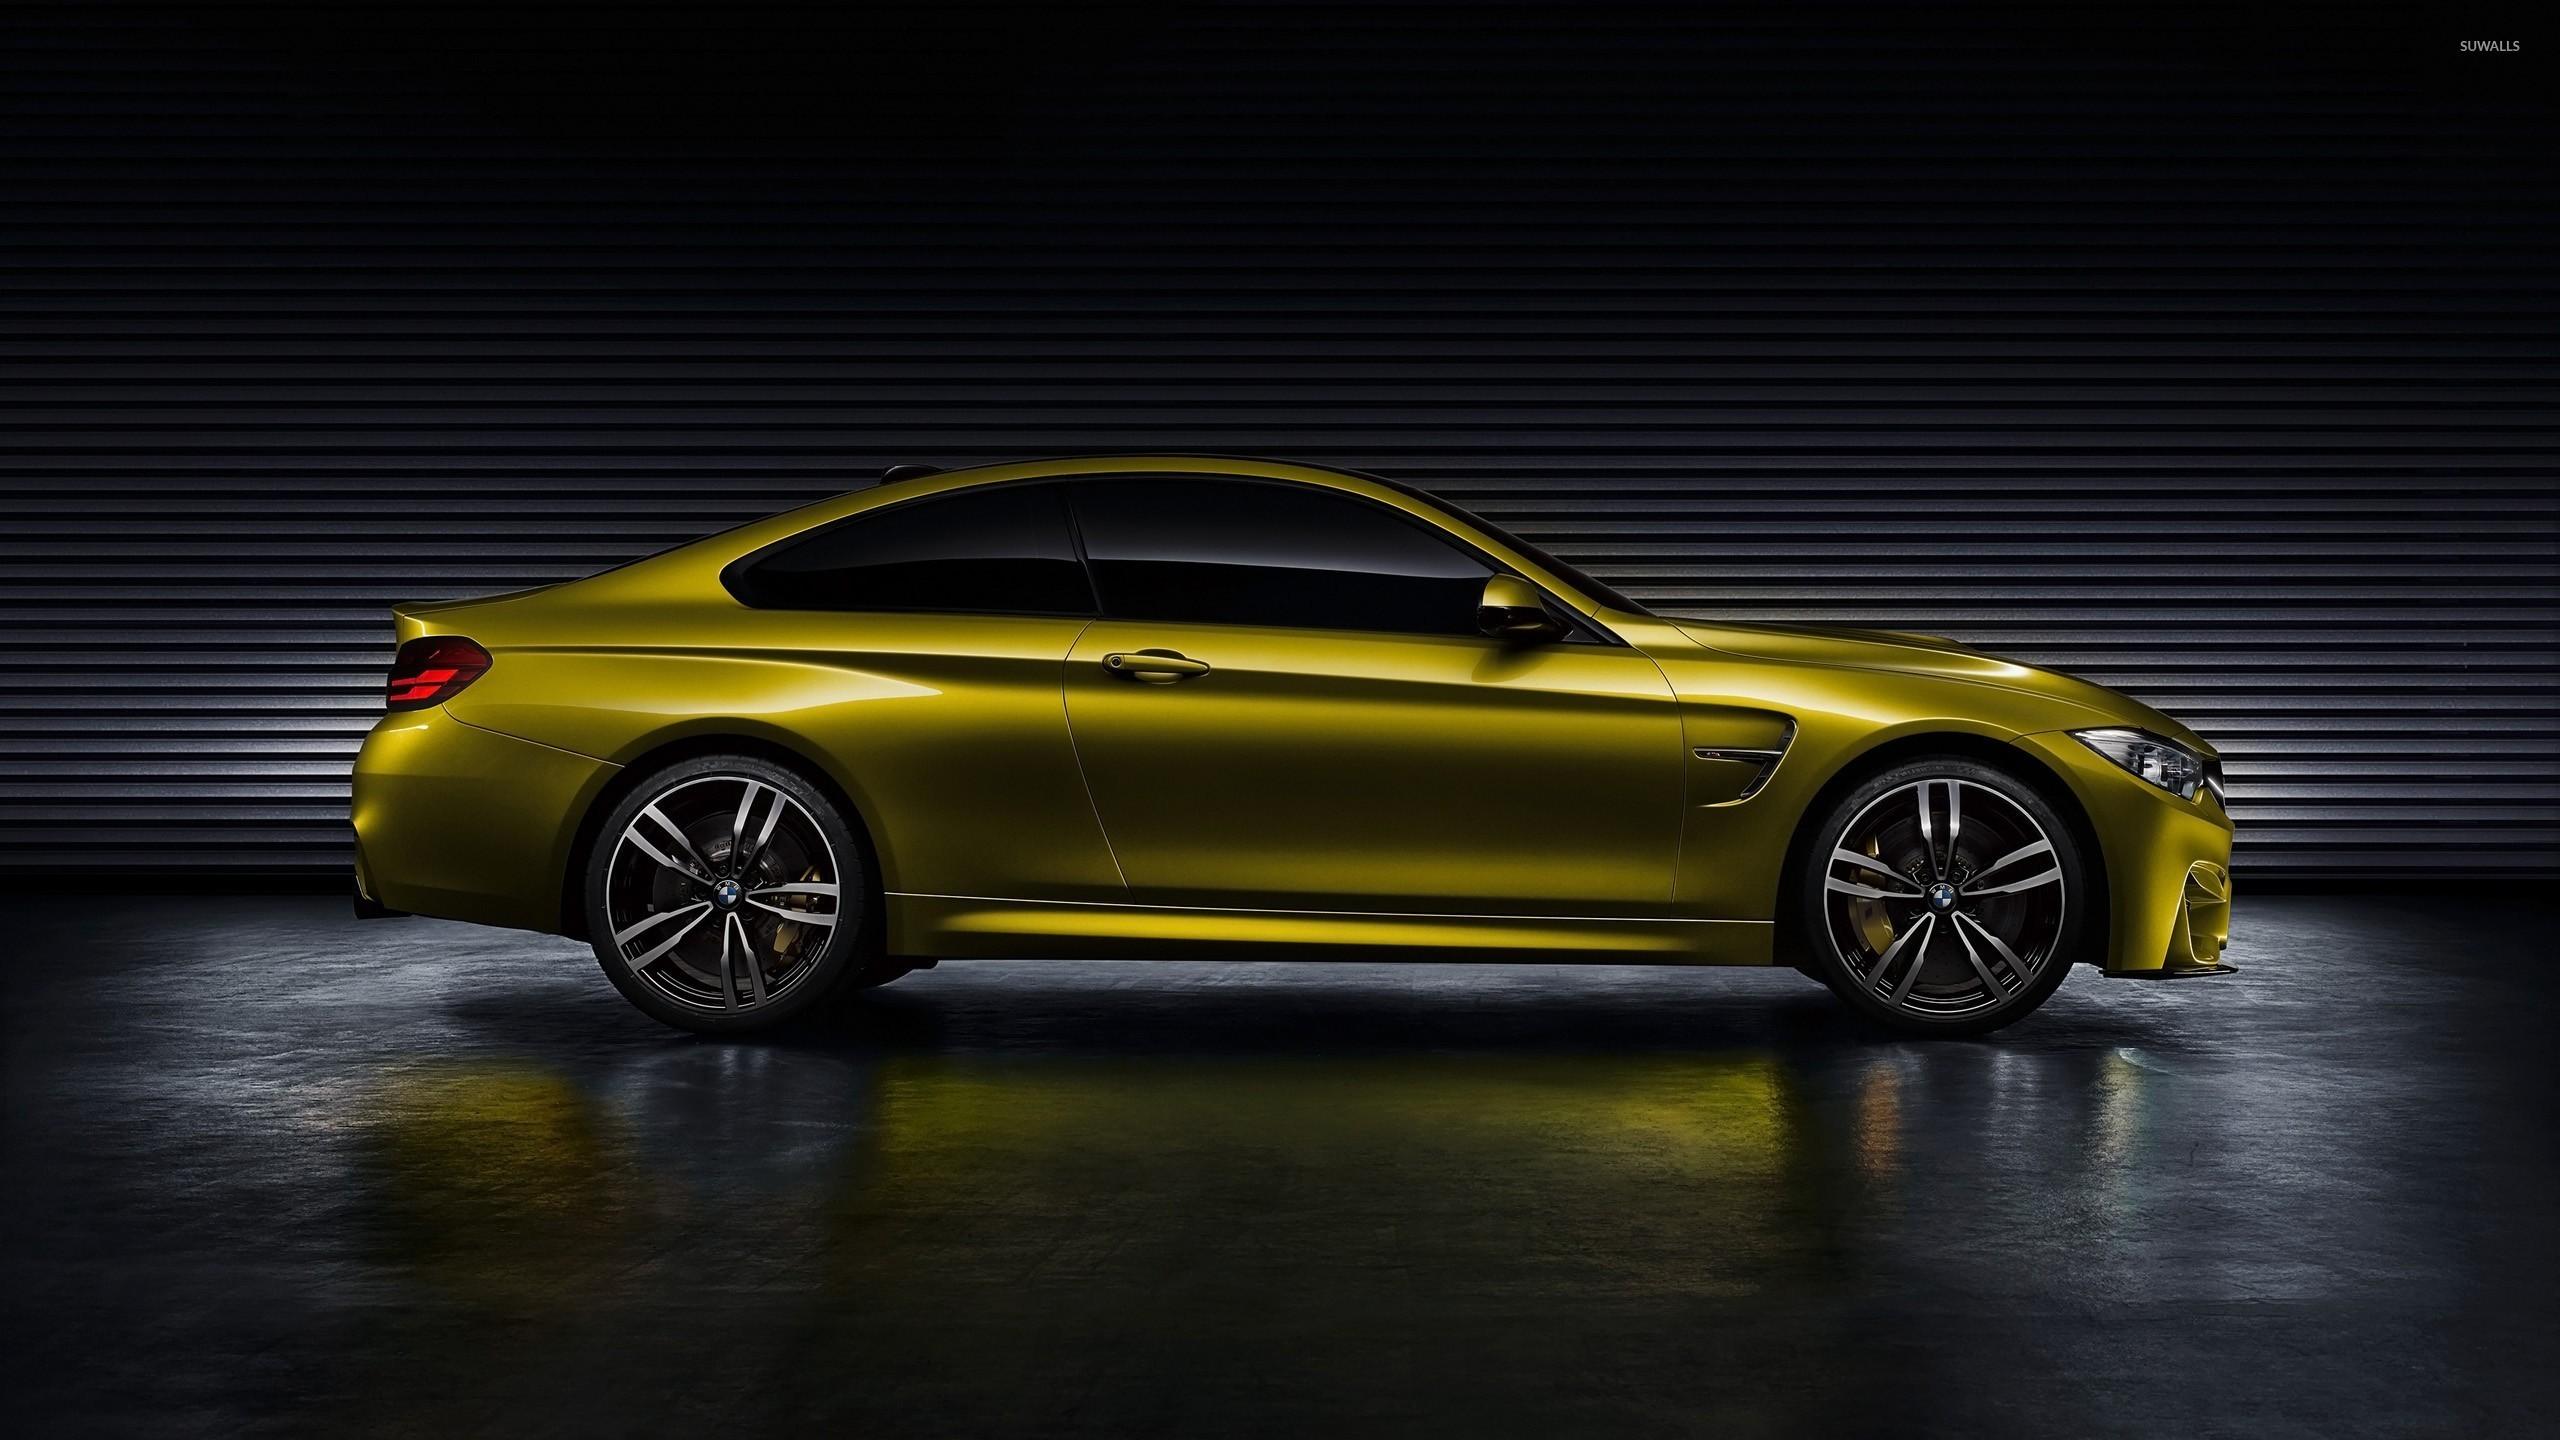 2013 BMW M4 Concept [3] wallpaper - Car wallpapers - #23060